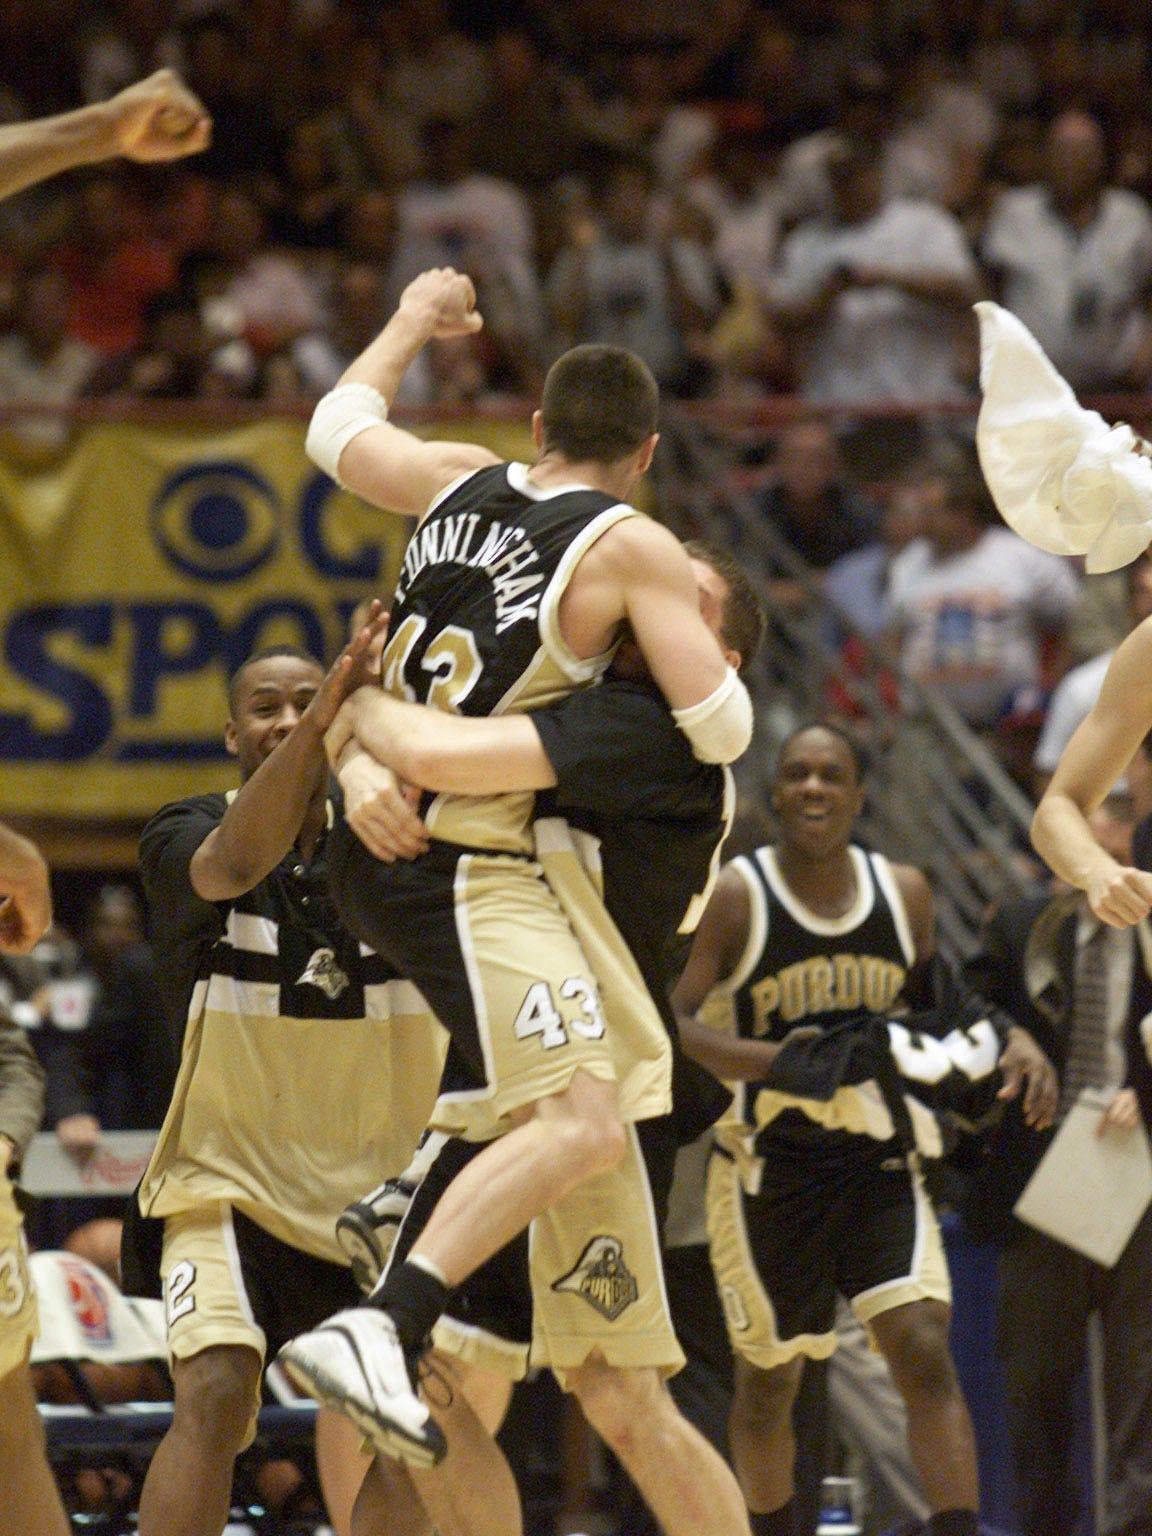 Carson Cunningham and his Purdue teammates celebrate